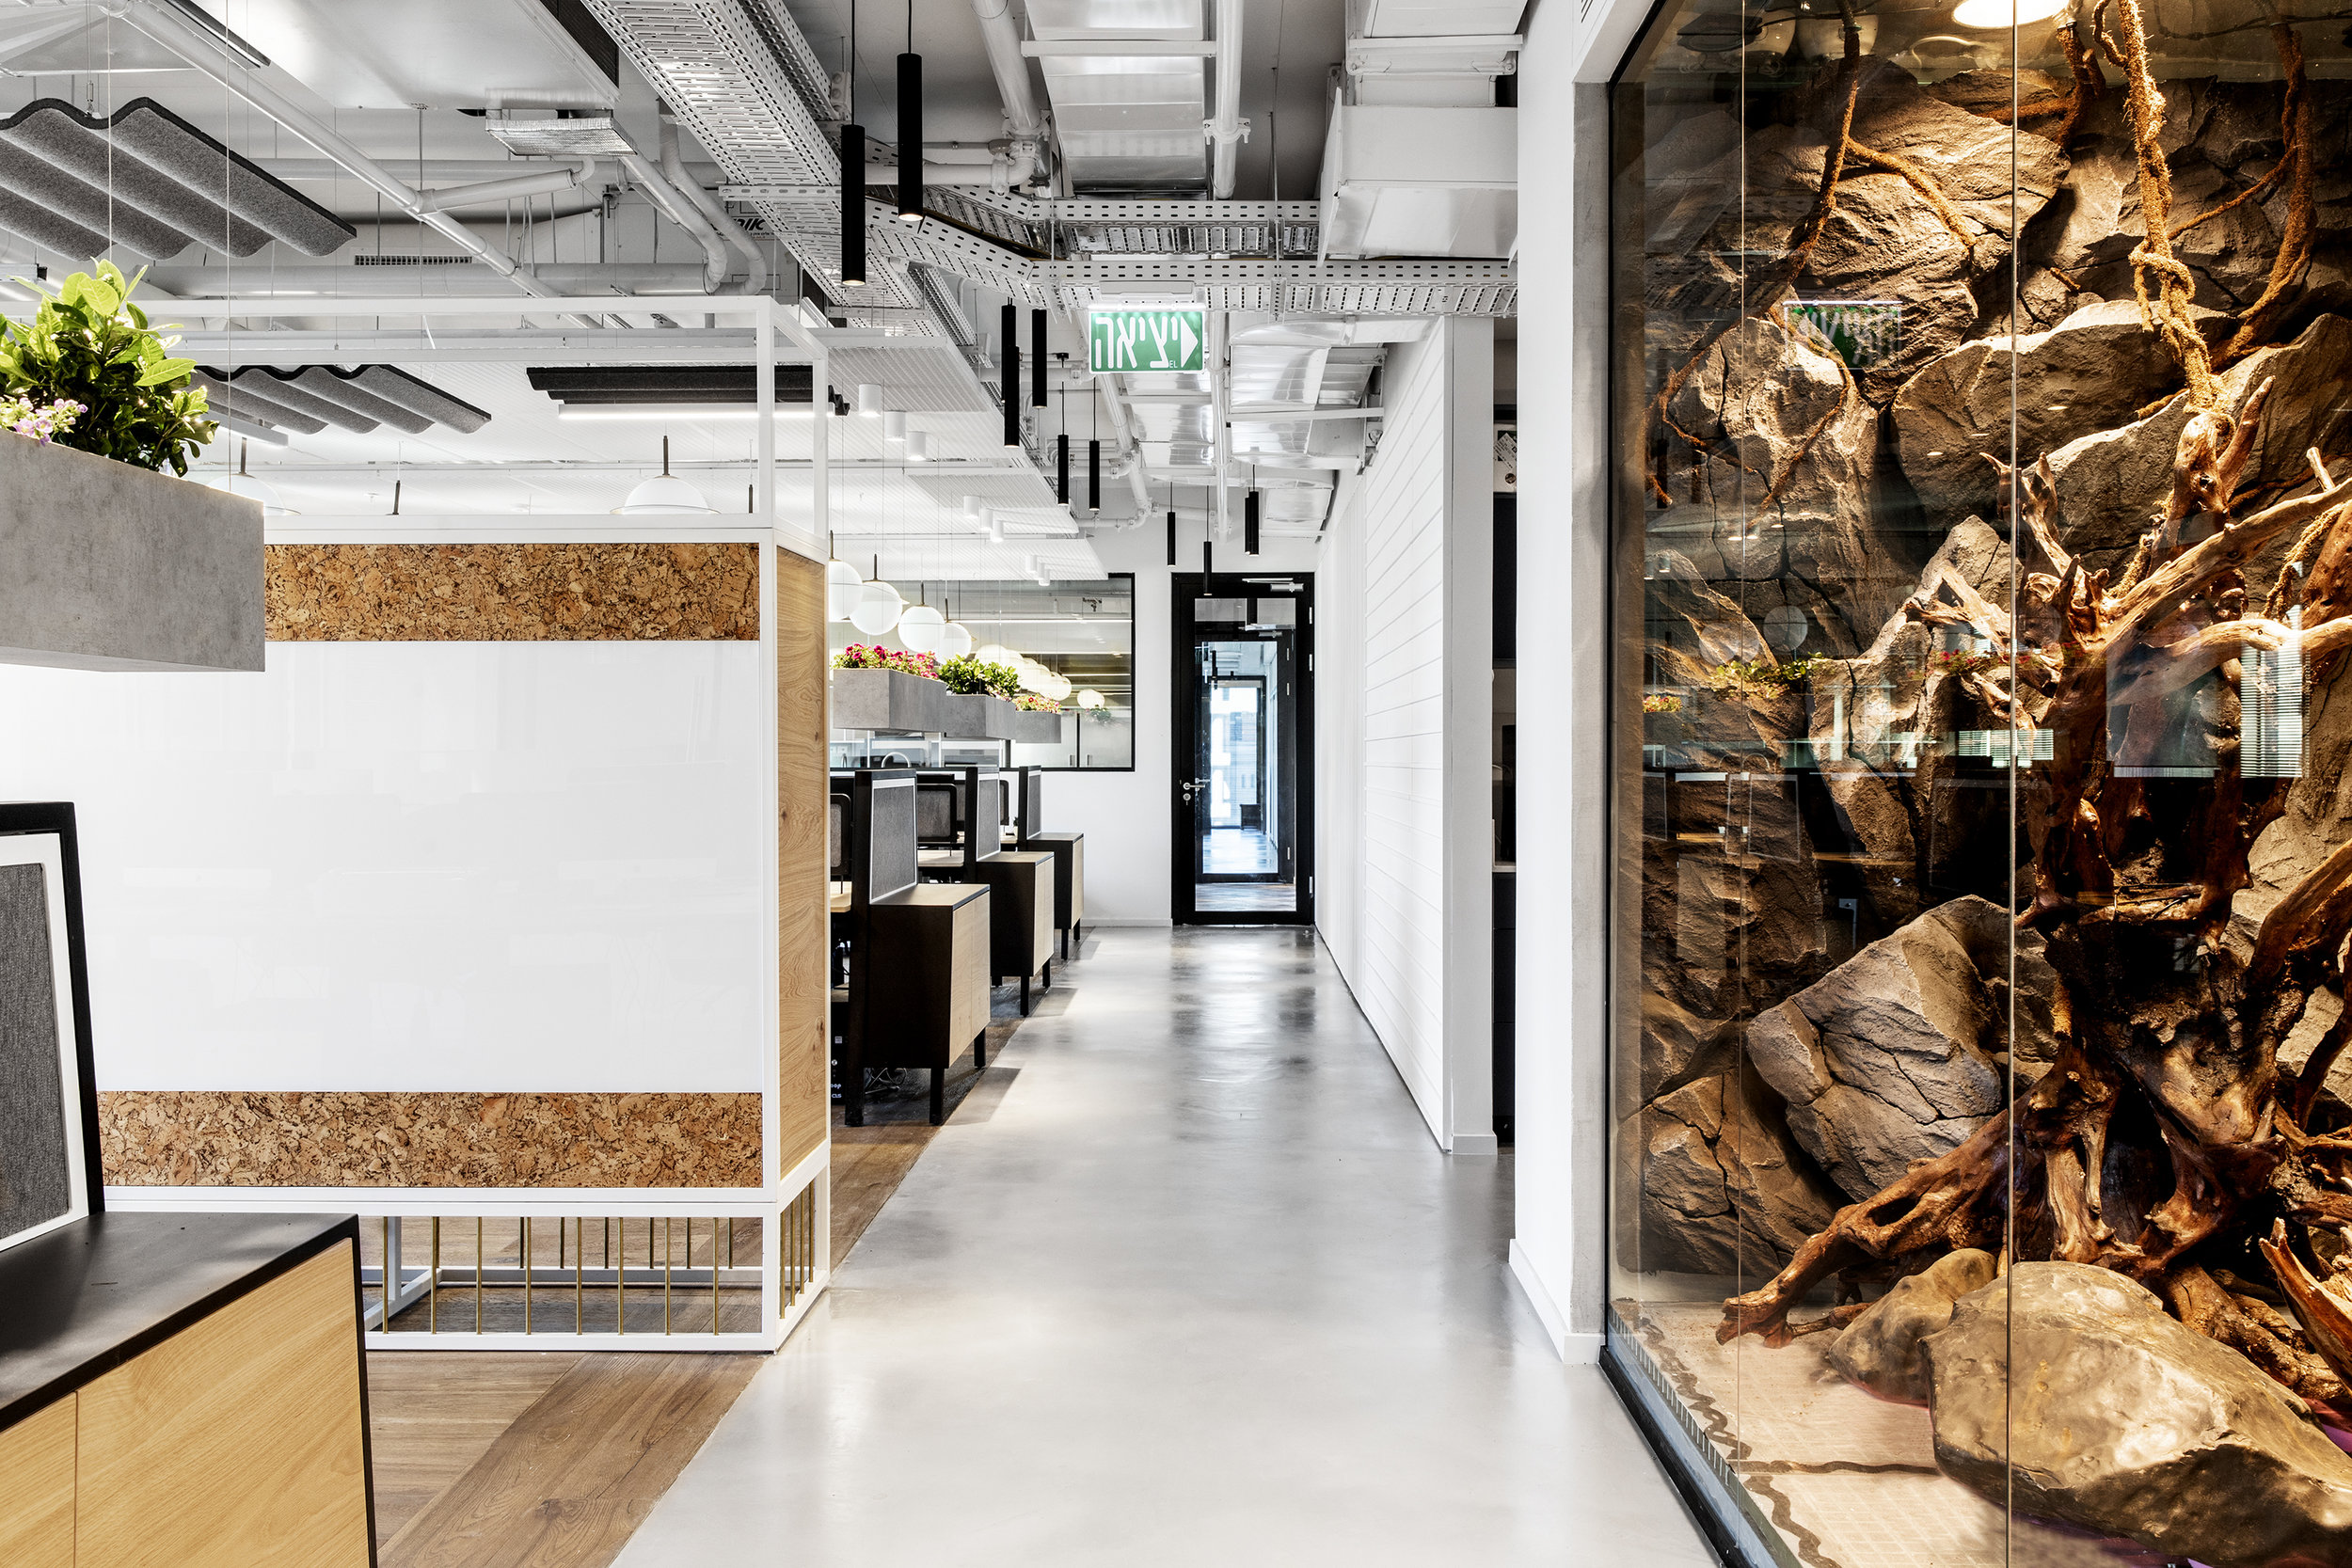 R2NET OFFICES - ROY DAVID ARCHITECTURE  STUDIO - רואי דוד אדריכלות סטודיו אדריכלים - אר2נט (37).jpg